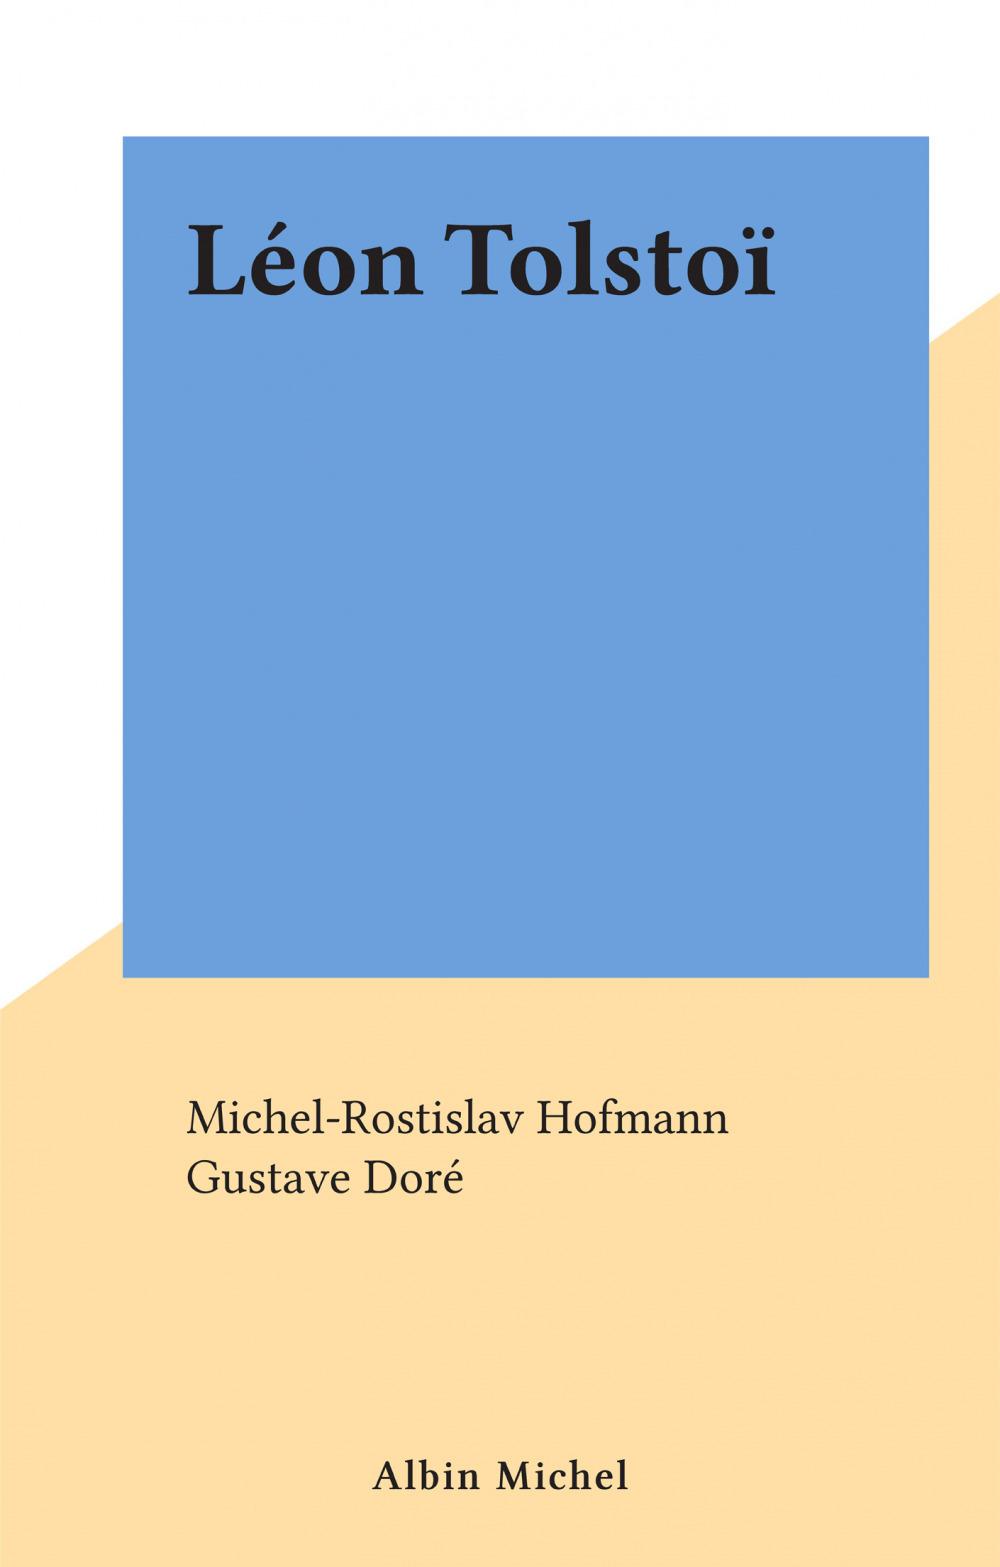 Léon Tolstoï  - Michel-Rostislav Hofmann